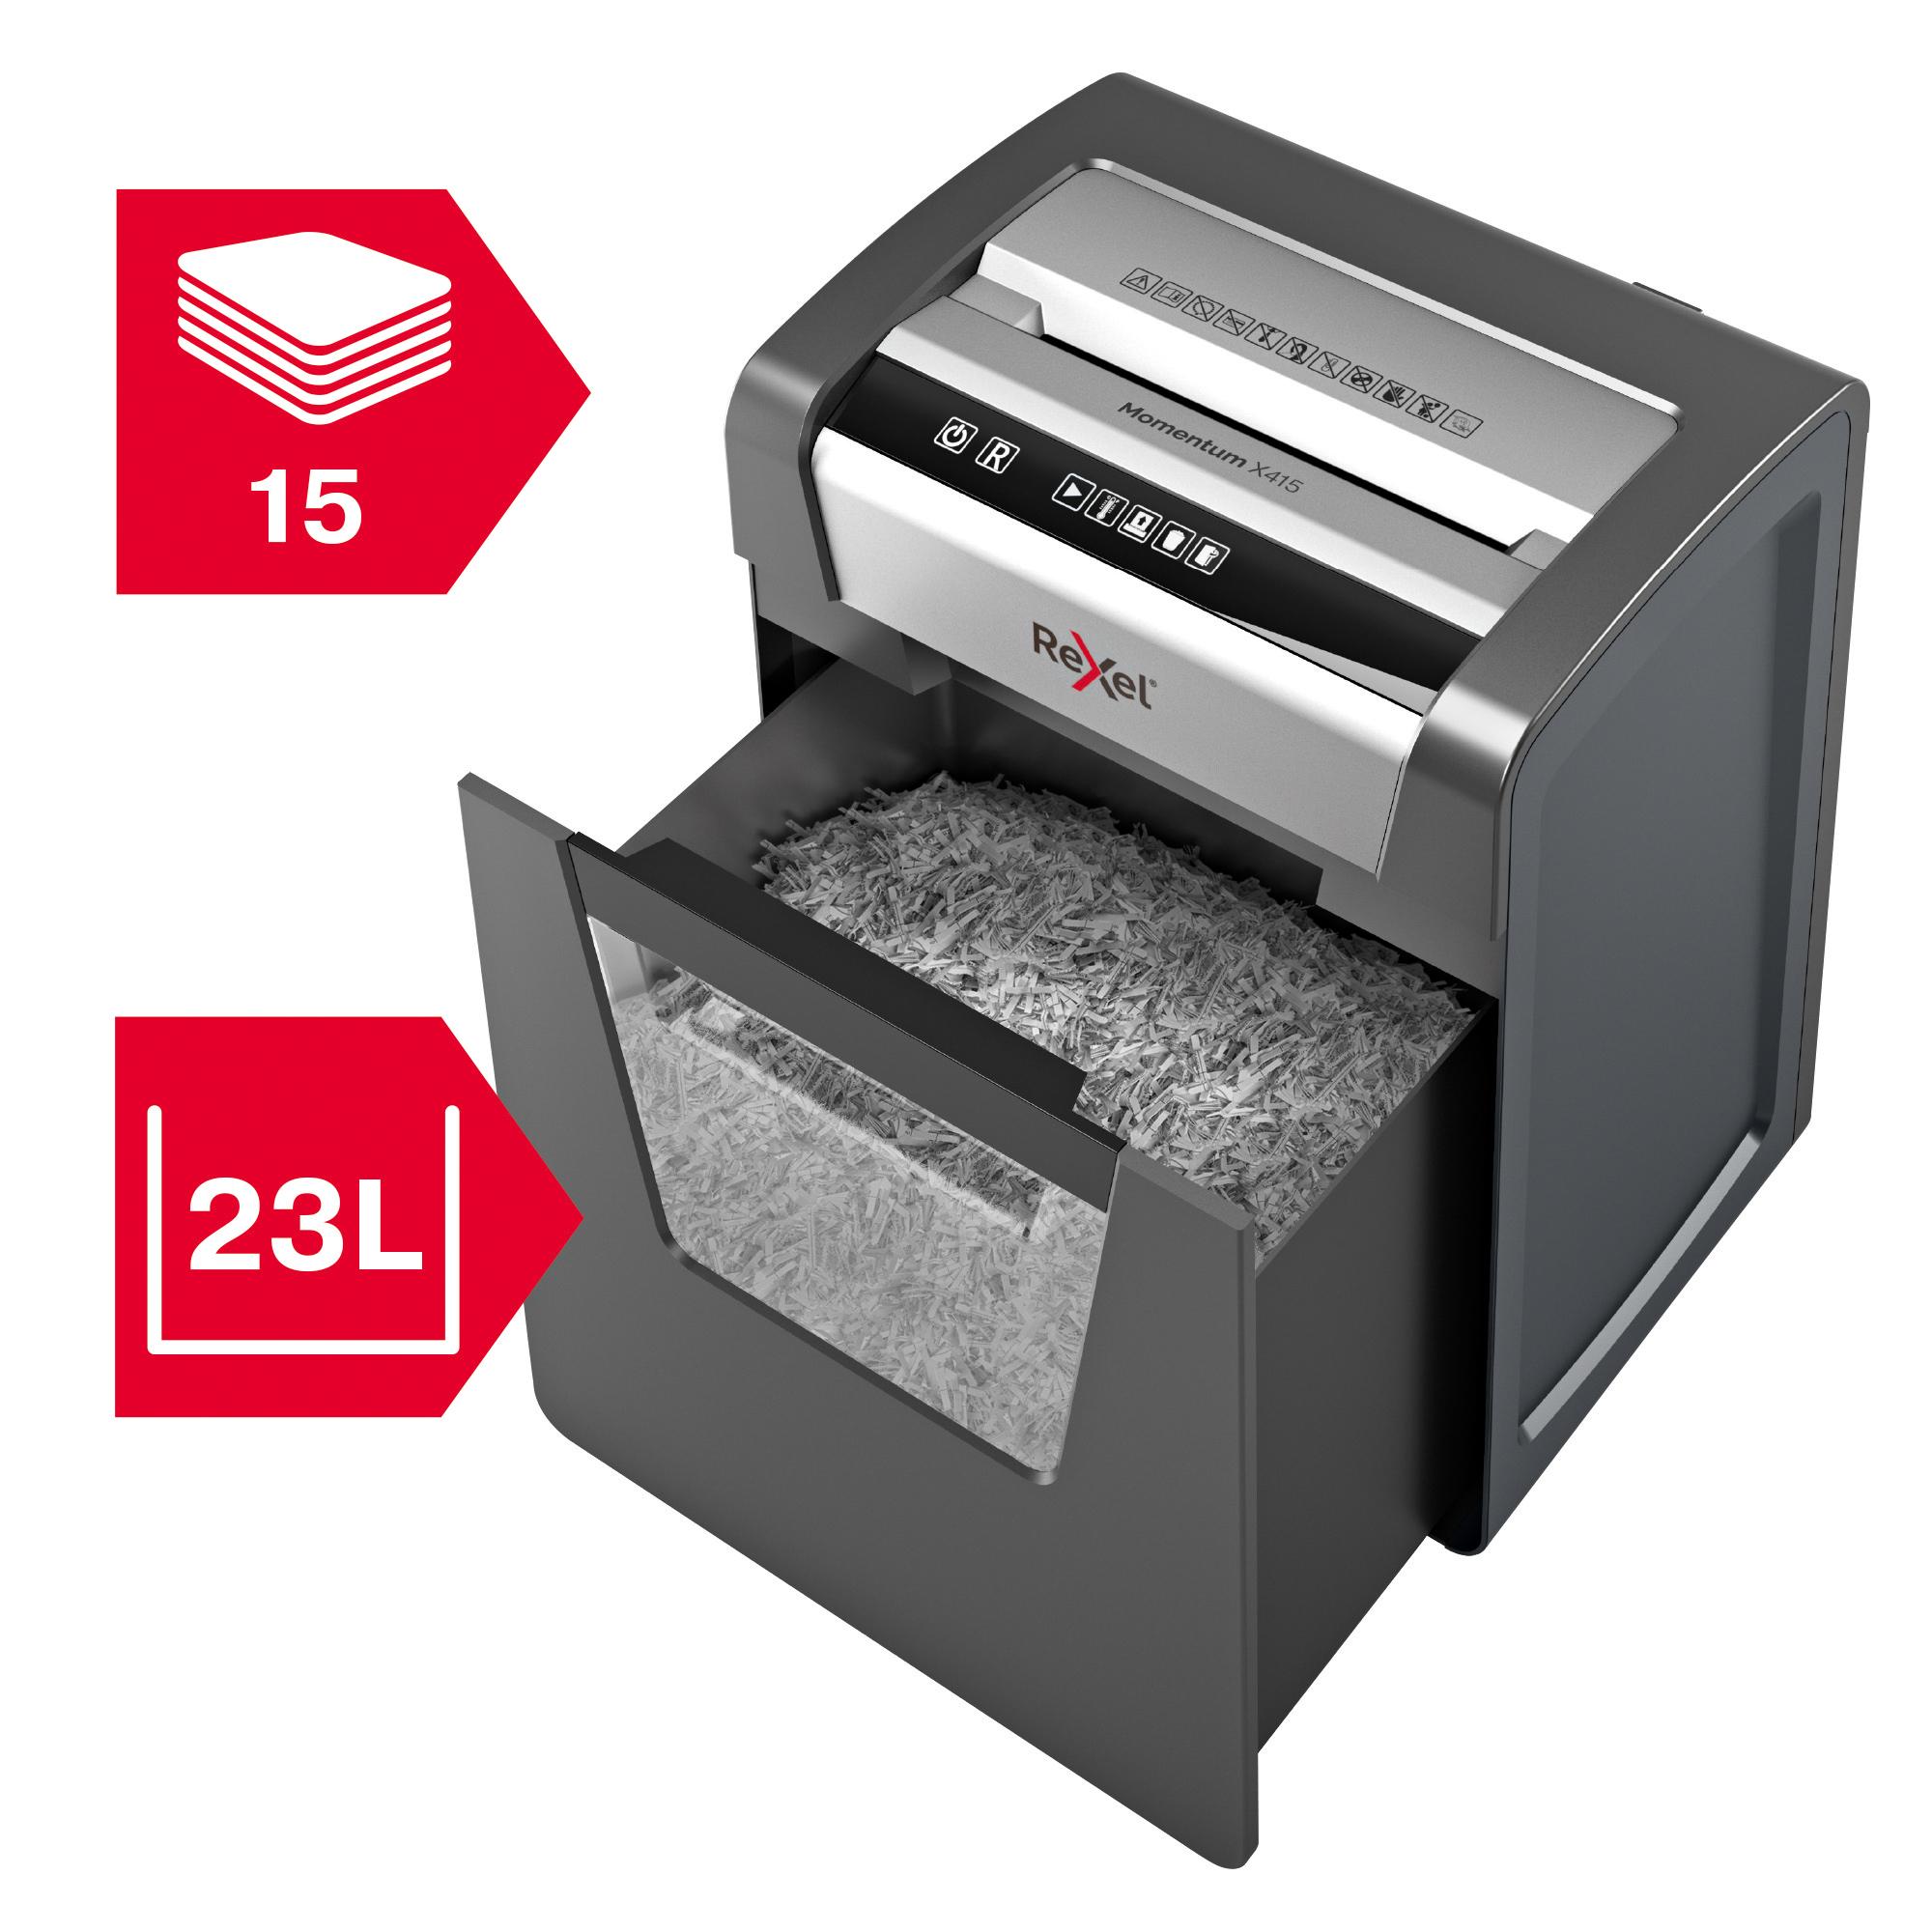 Rexel Momentum X415 CC Paper Shredder P4 Cross Cut 23L Anti-Jamming Ref 2104576 [REDEMPTION] Jul-Sep19